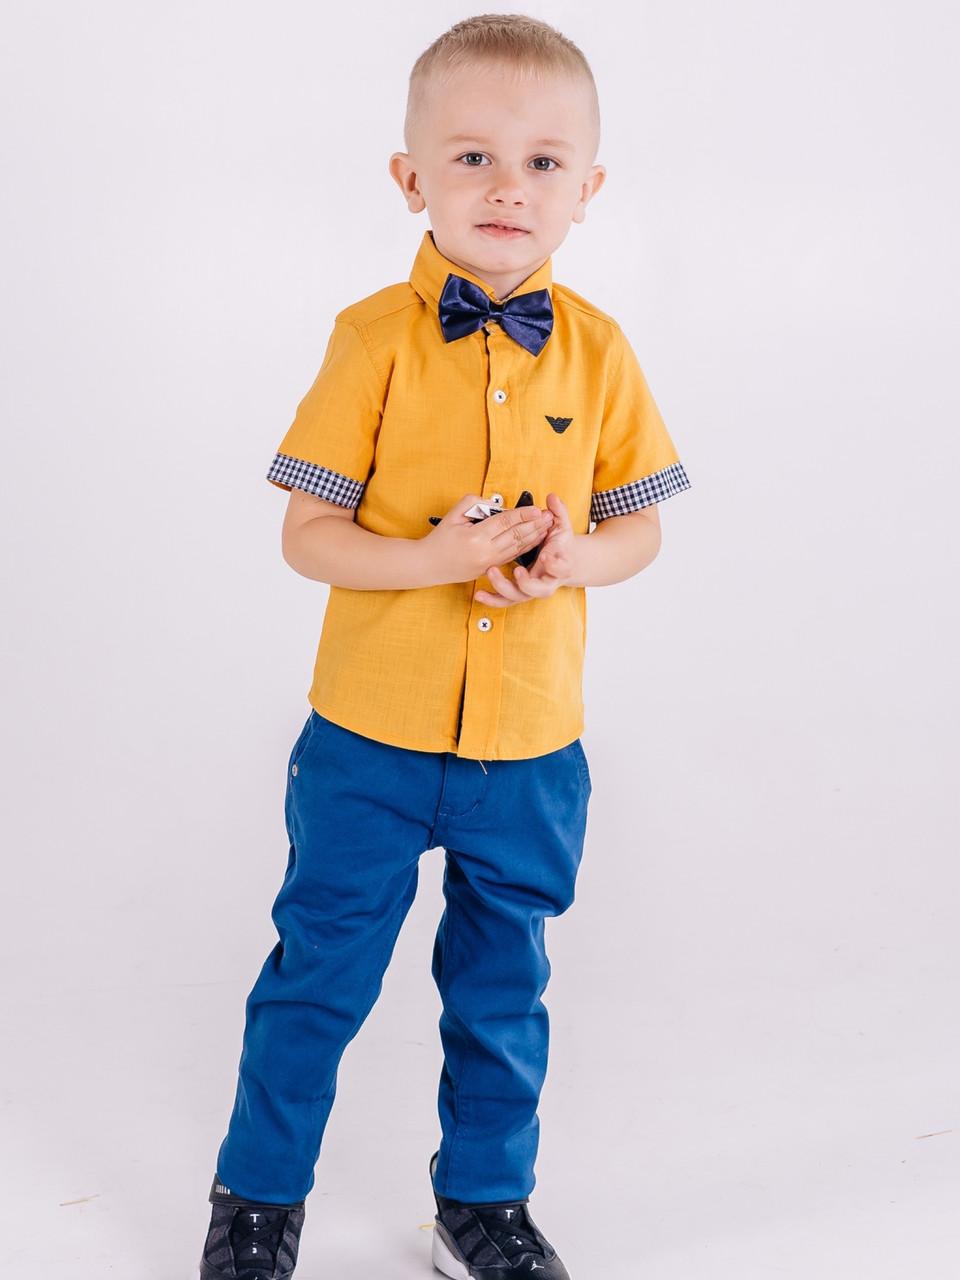 Оранжевая рубашка Armani с коротким рукавом для мальчика 3-4 года